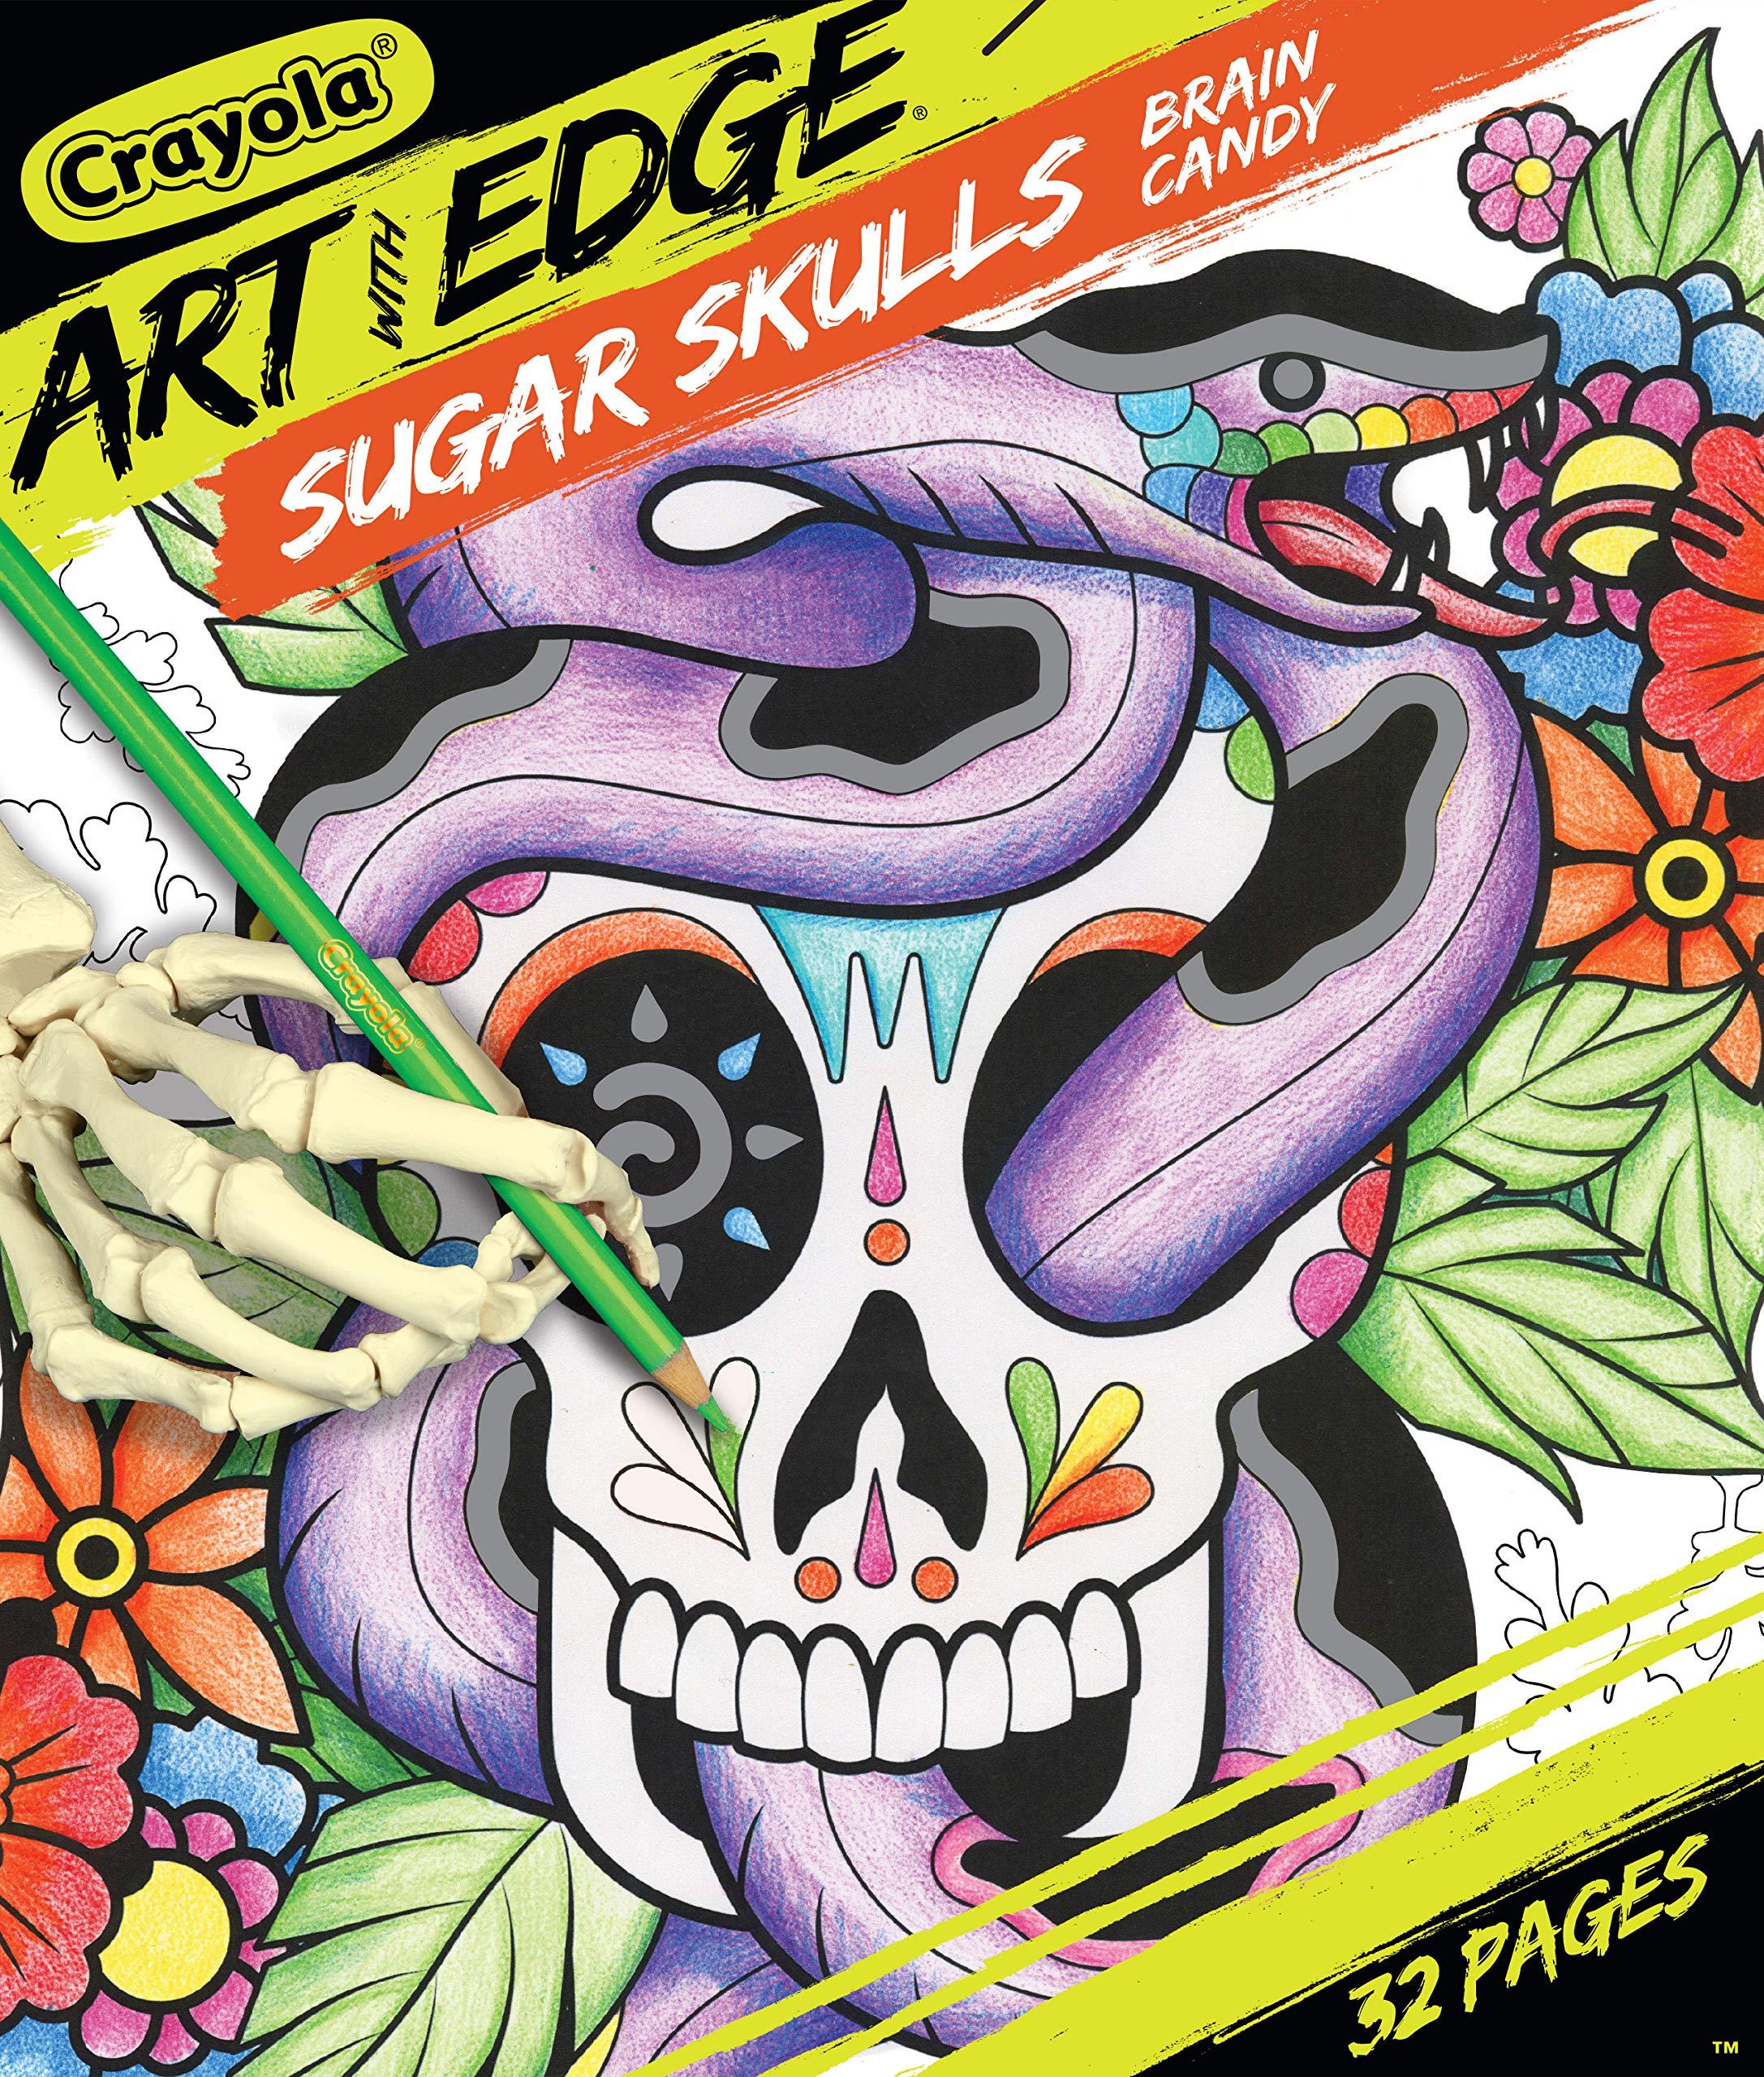 - Amazon.com: Crayola Sugar Skulls Coloring Book, Volume 3, Teen